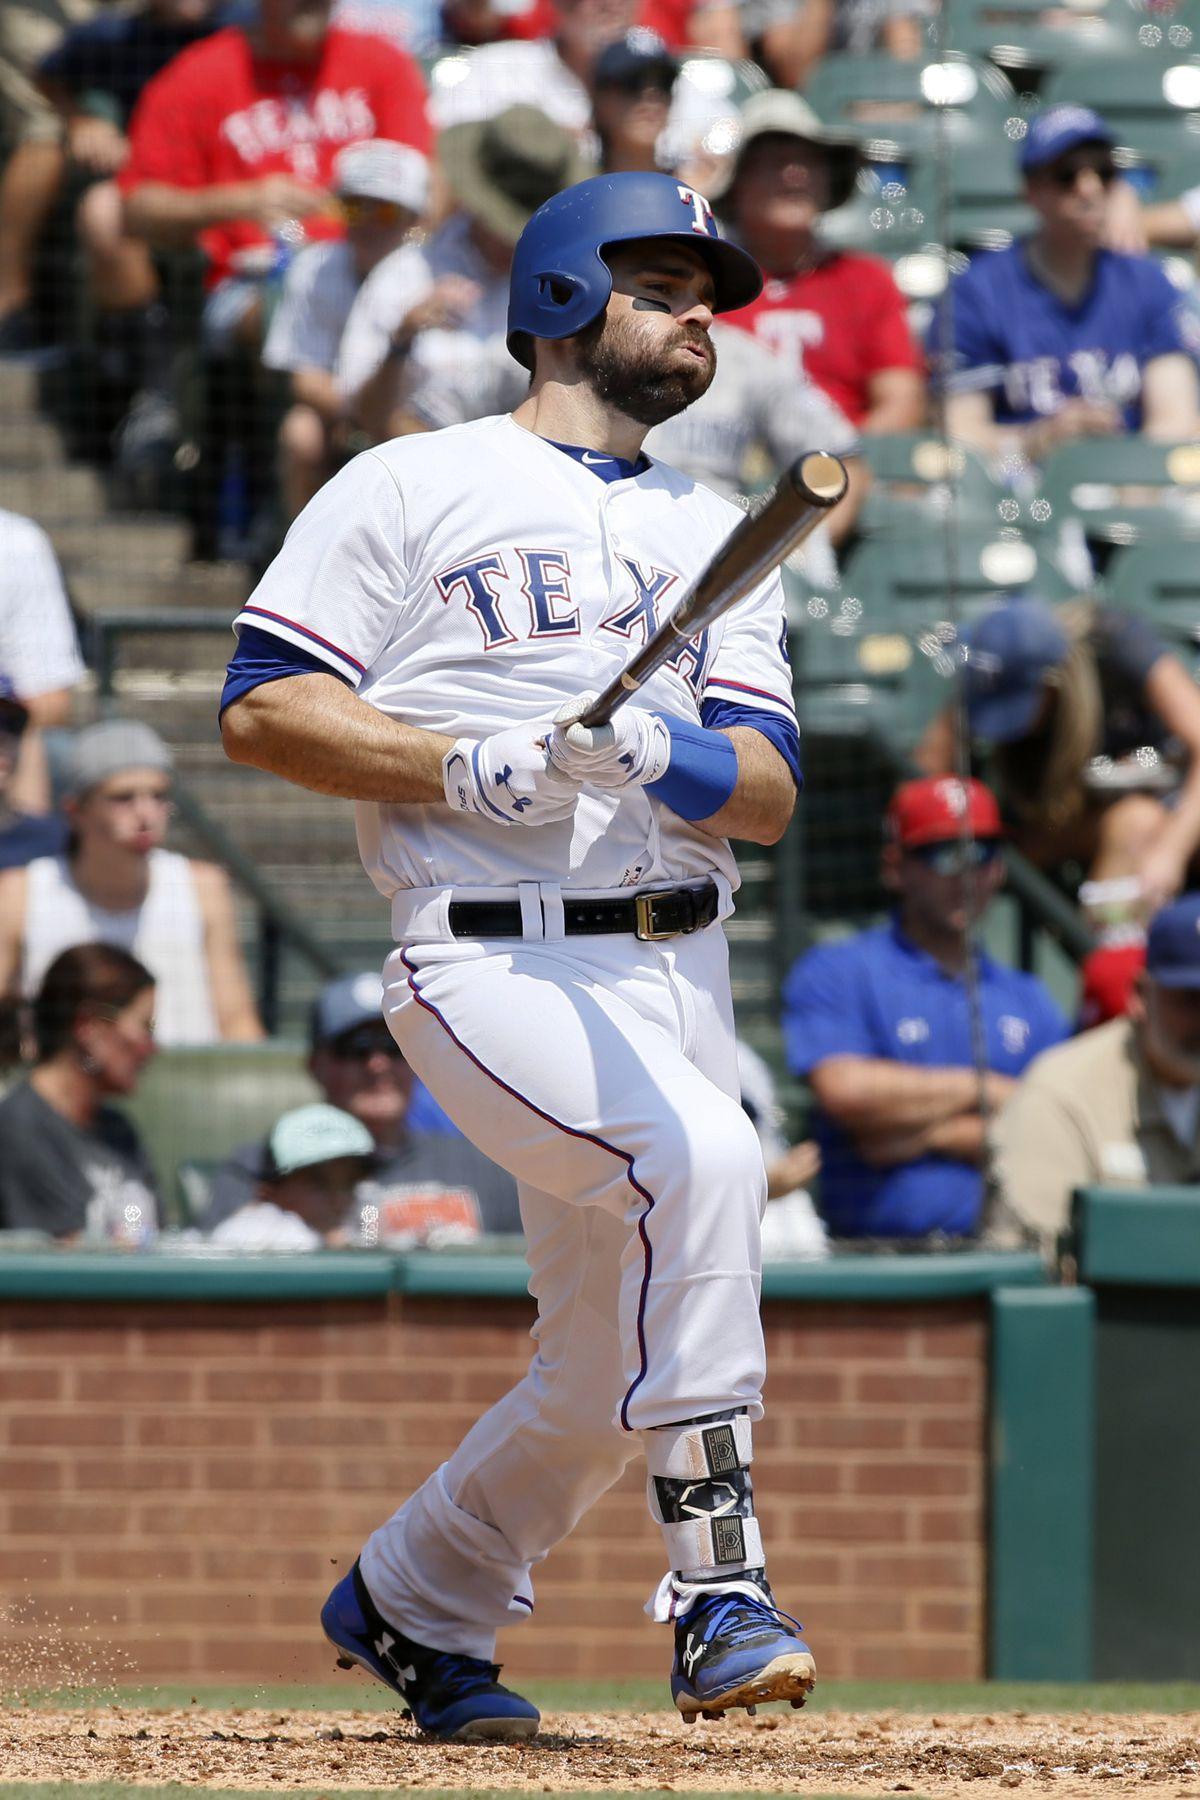 MLB: New York Yankees at Texas Rangers